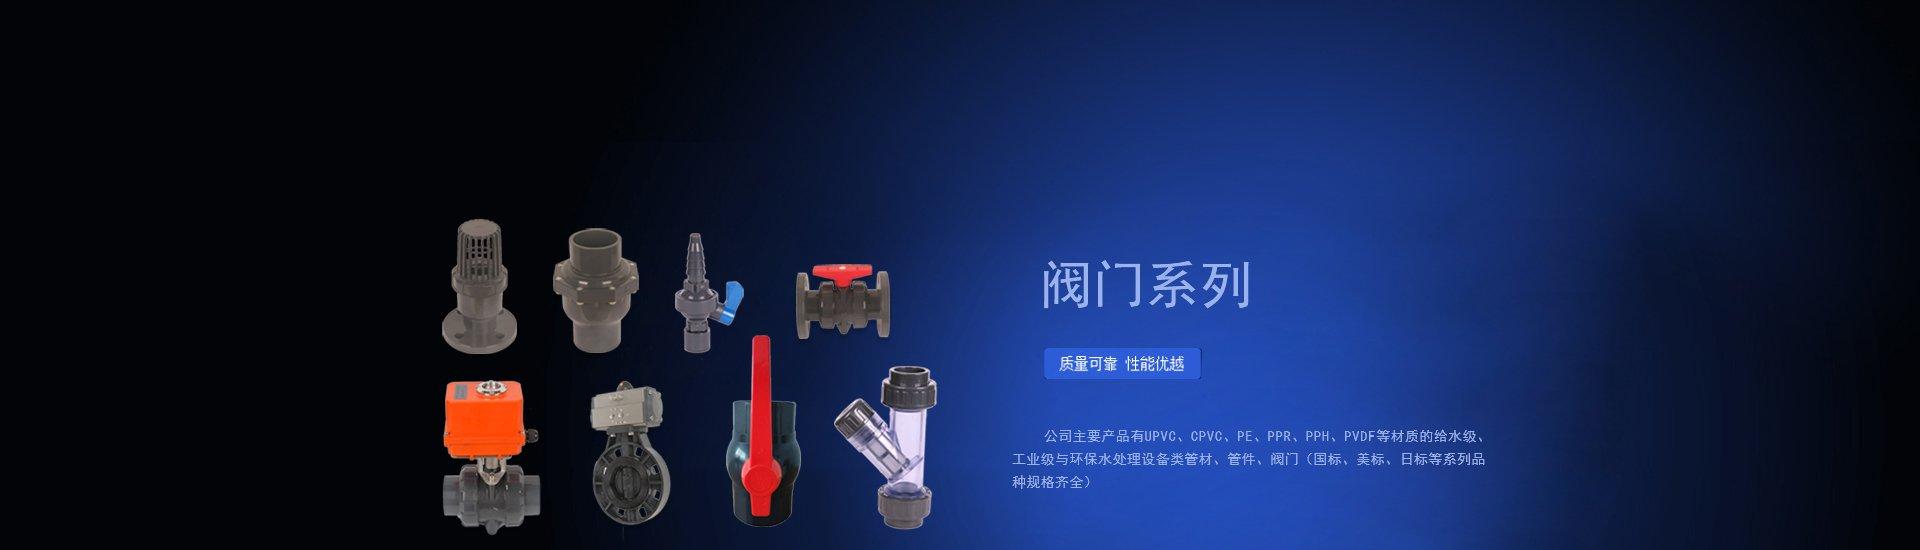 PVC化工管件,UPVC工业管材管件产品途